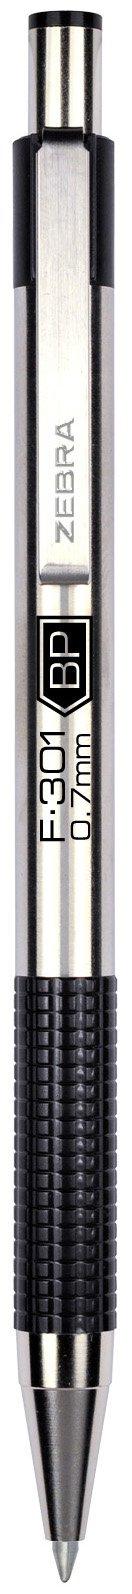 Zebra F-301 Ballpoint Stainless Steel Retractable Pen, Fine Point, 0.7mm, Black Ink, 1-Count